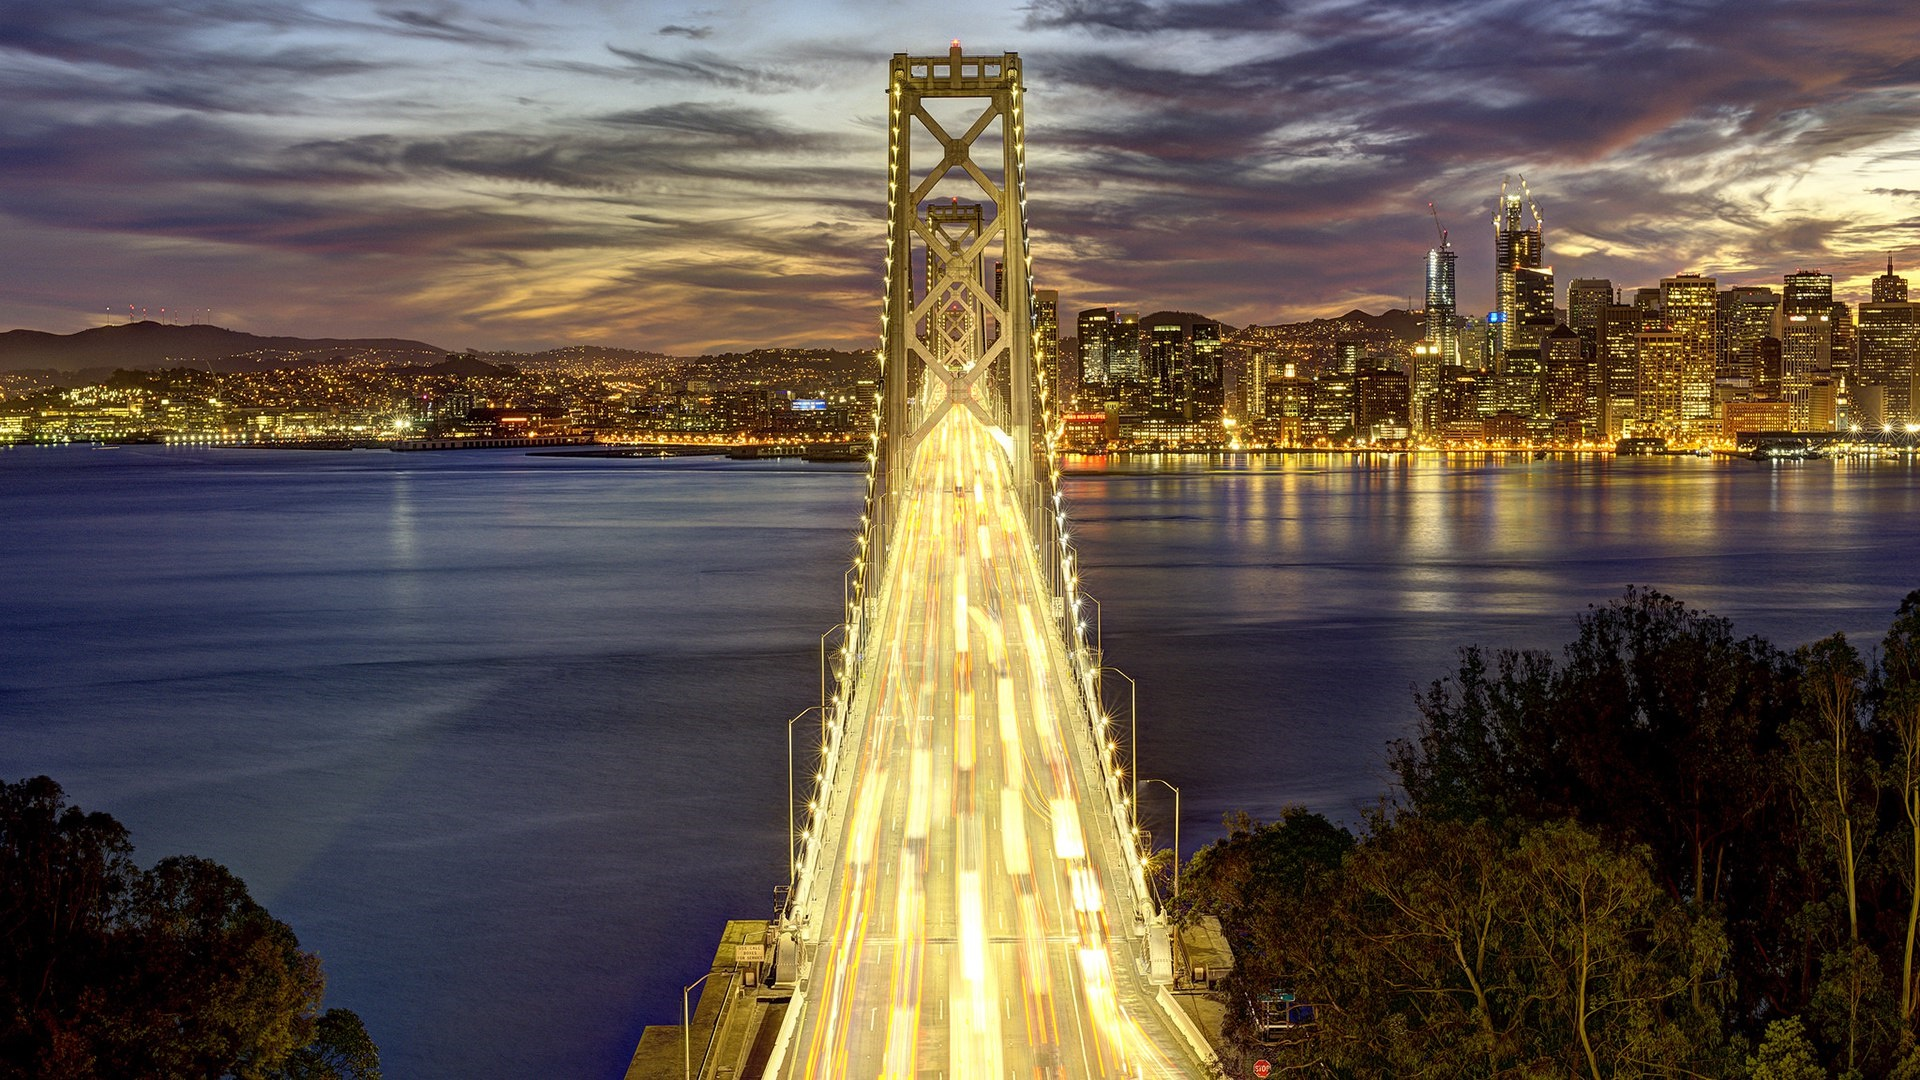 Bay Area wallpaper free